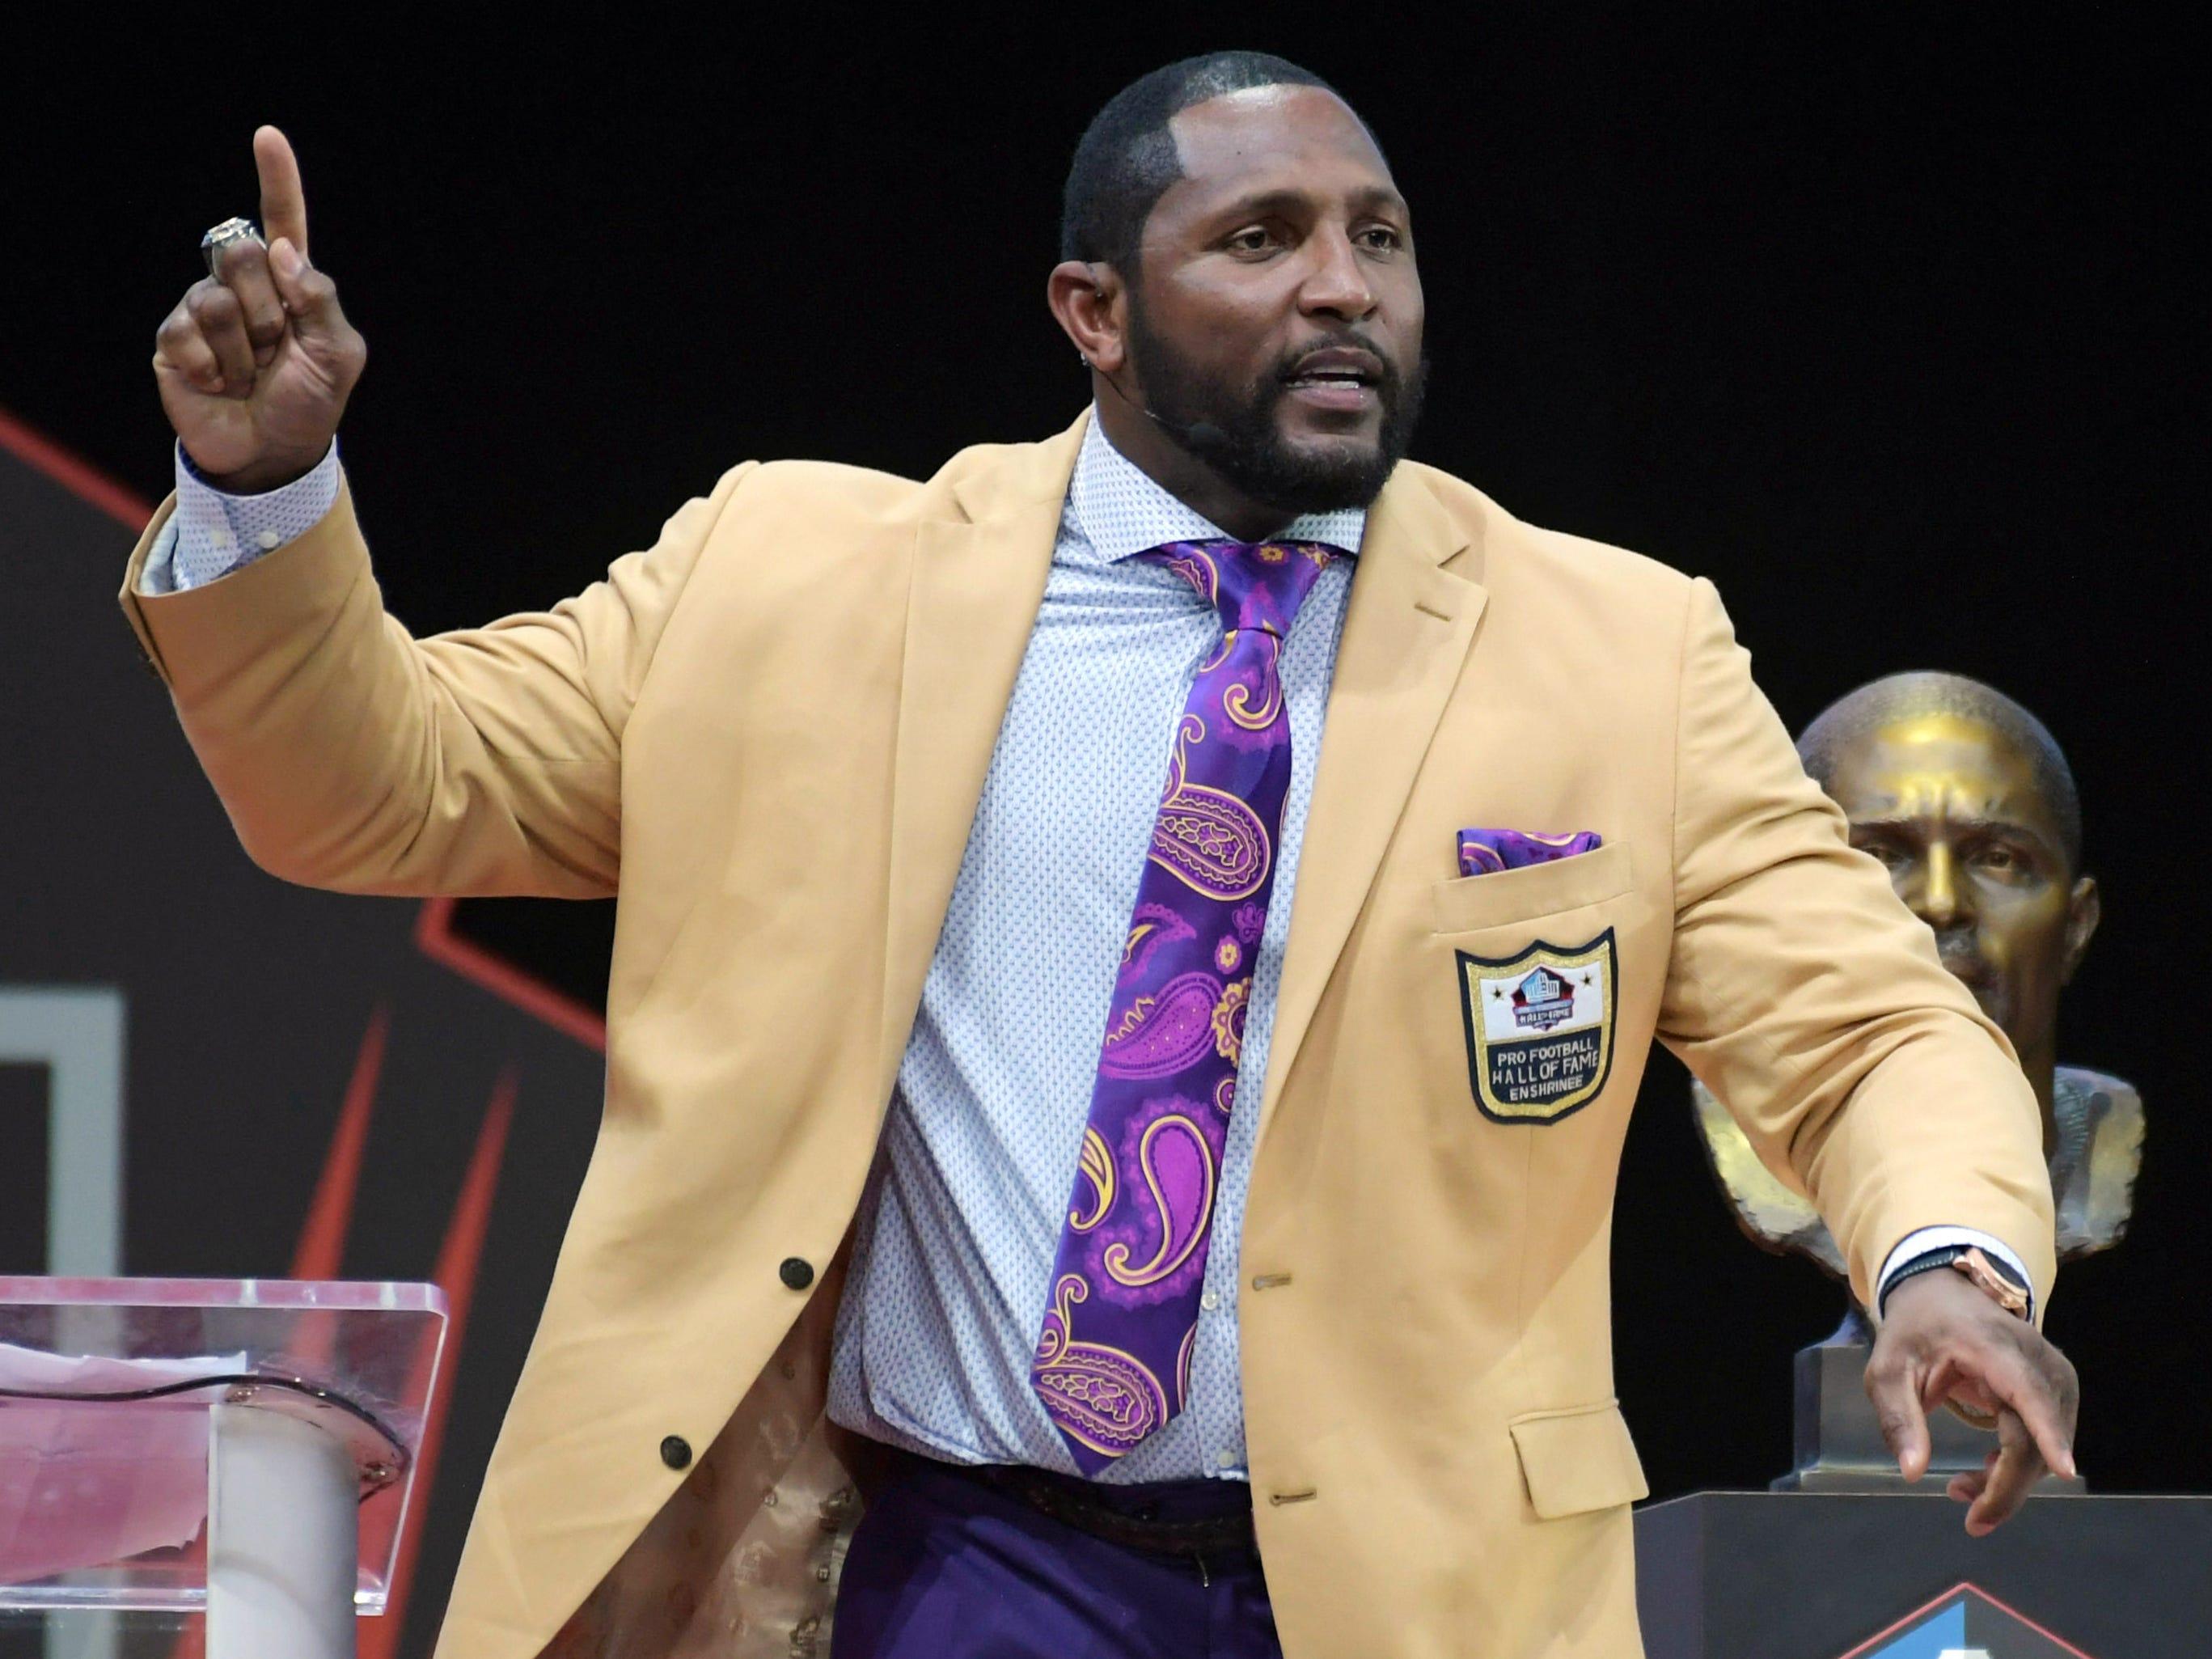 Former Baltimore Ravens linebacker Ray Lewis during the Pro Football Hall of Fame Enshrinement Ceremony at Tom Bensen Stadium.